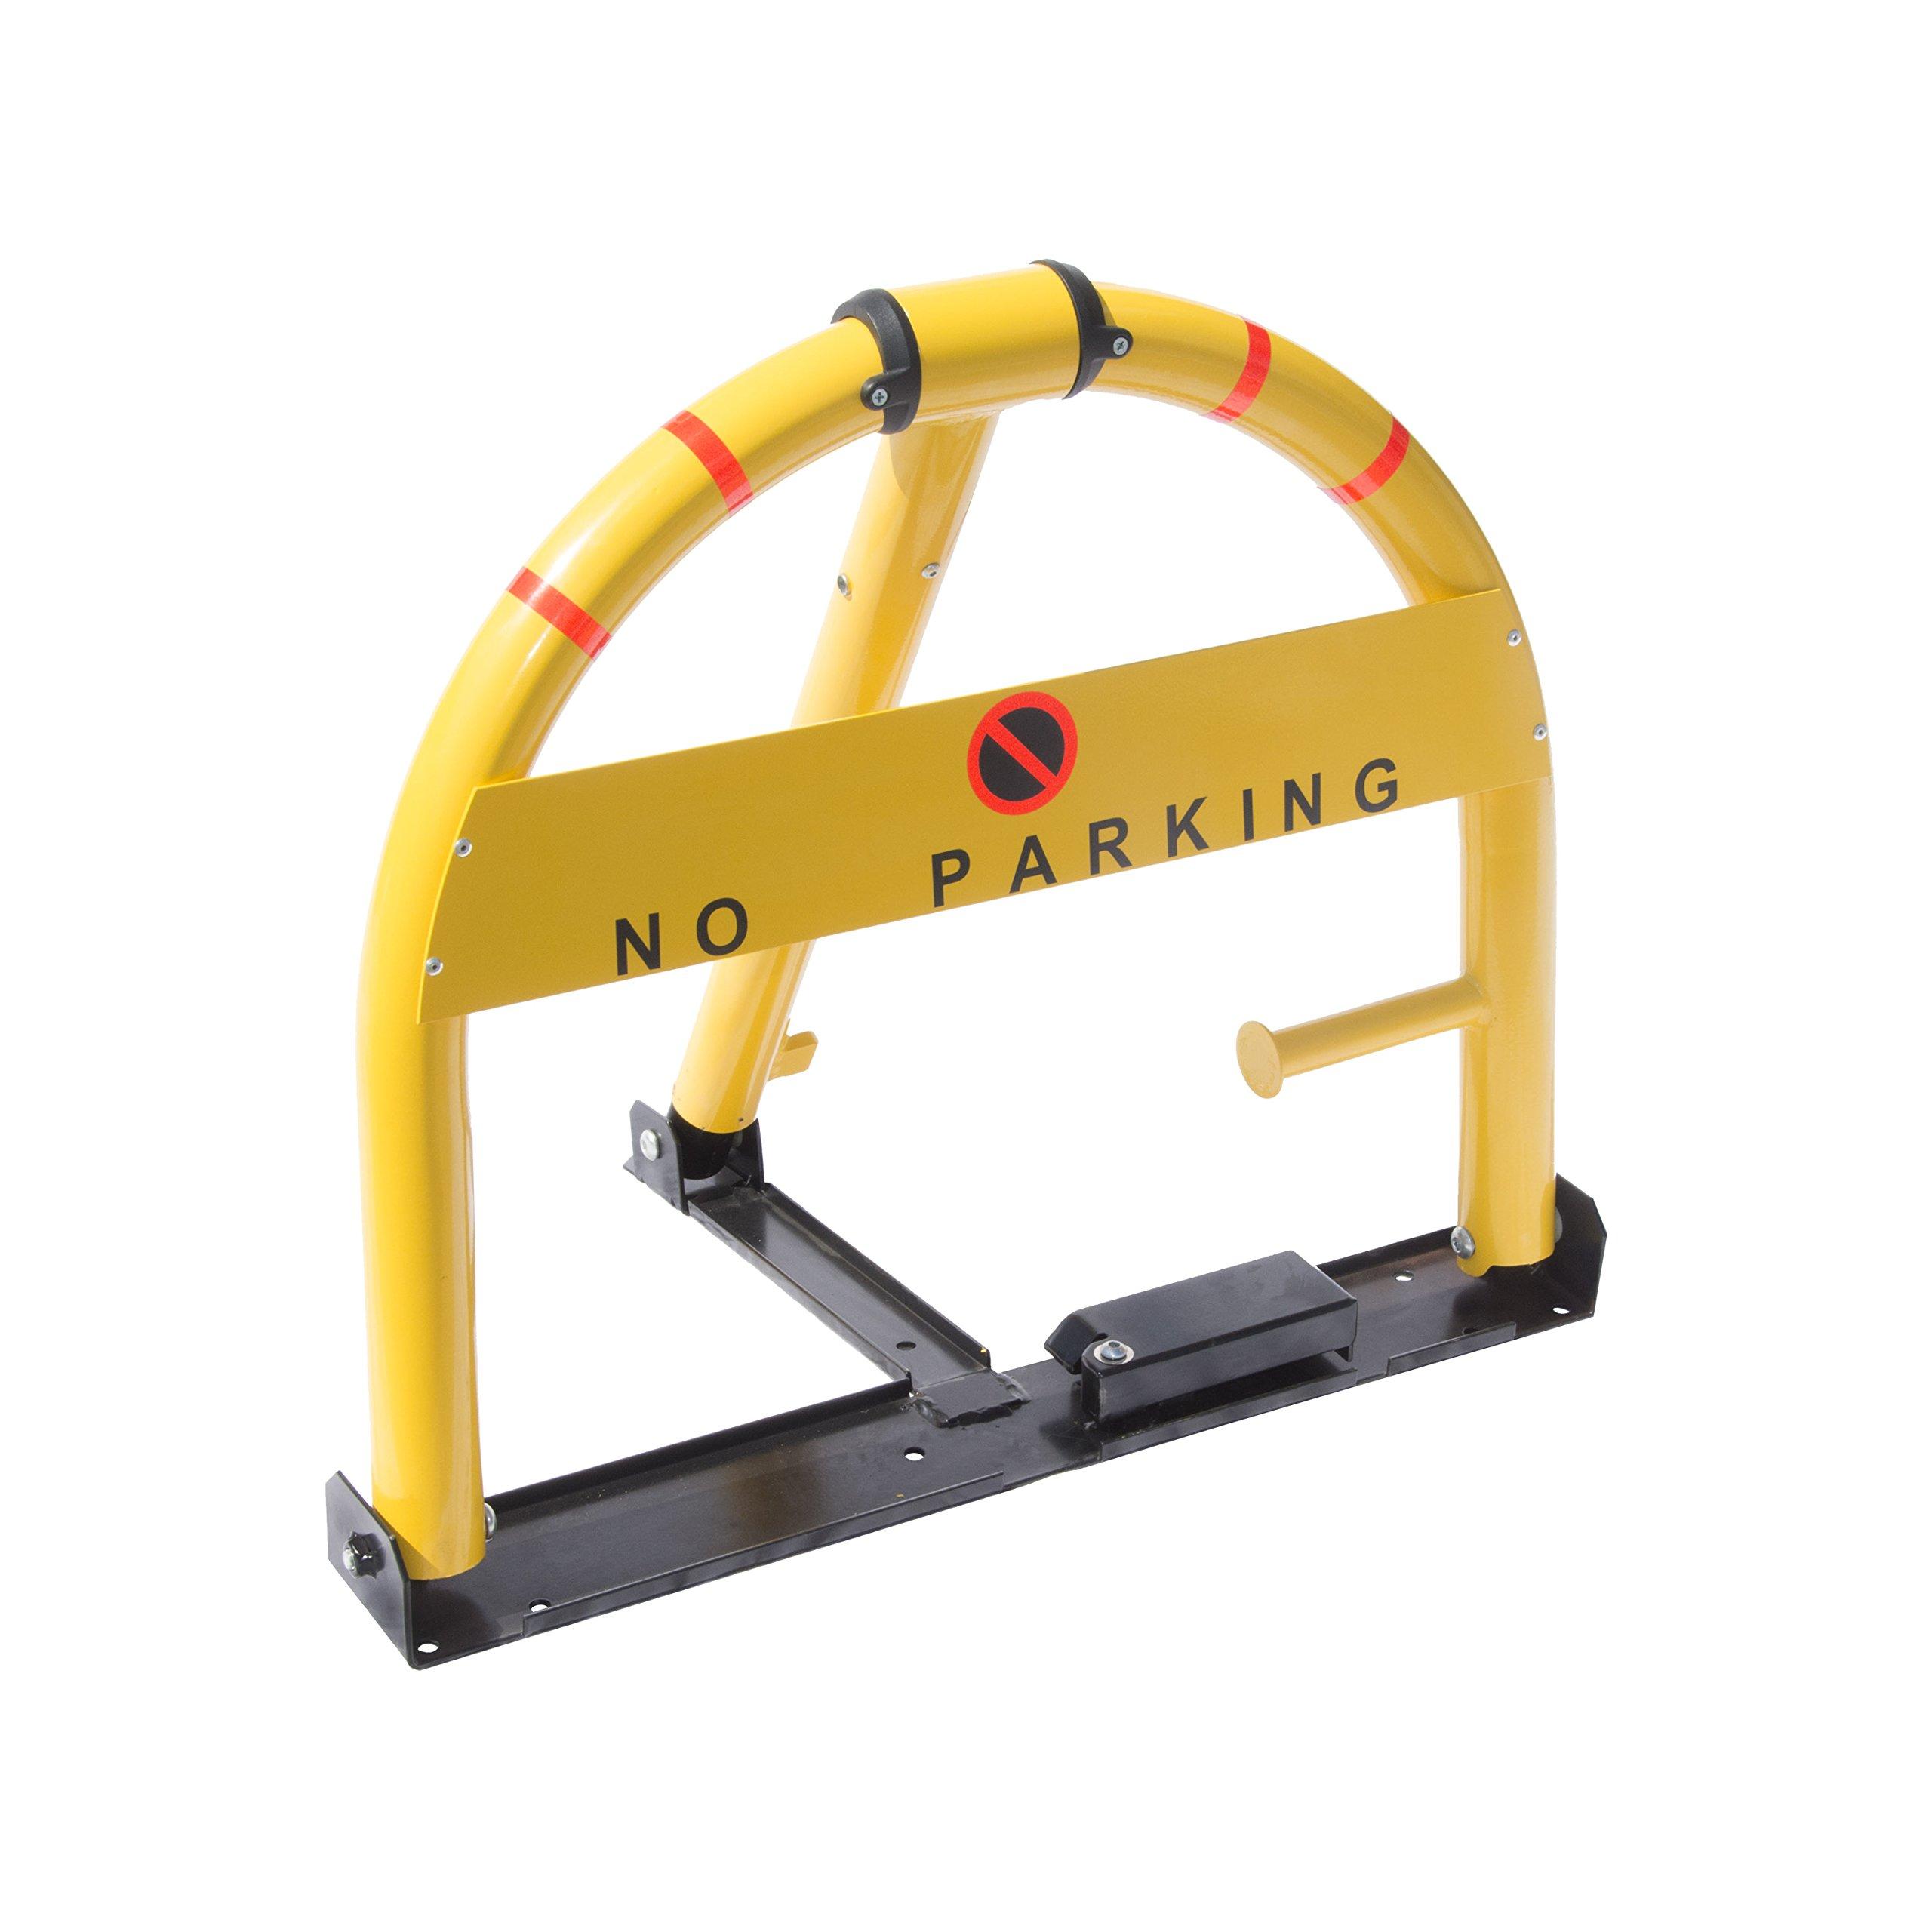 ALEKO PLSF02 Semiautomatic Foot Operated Parking Lock